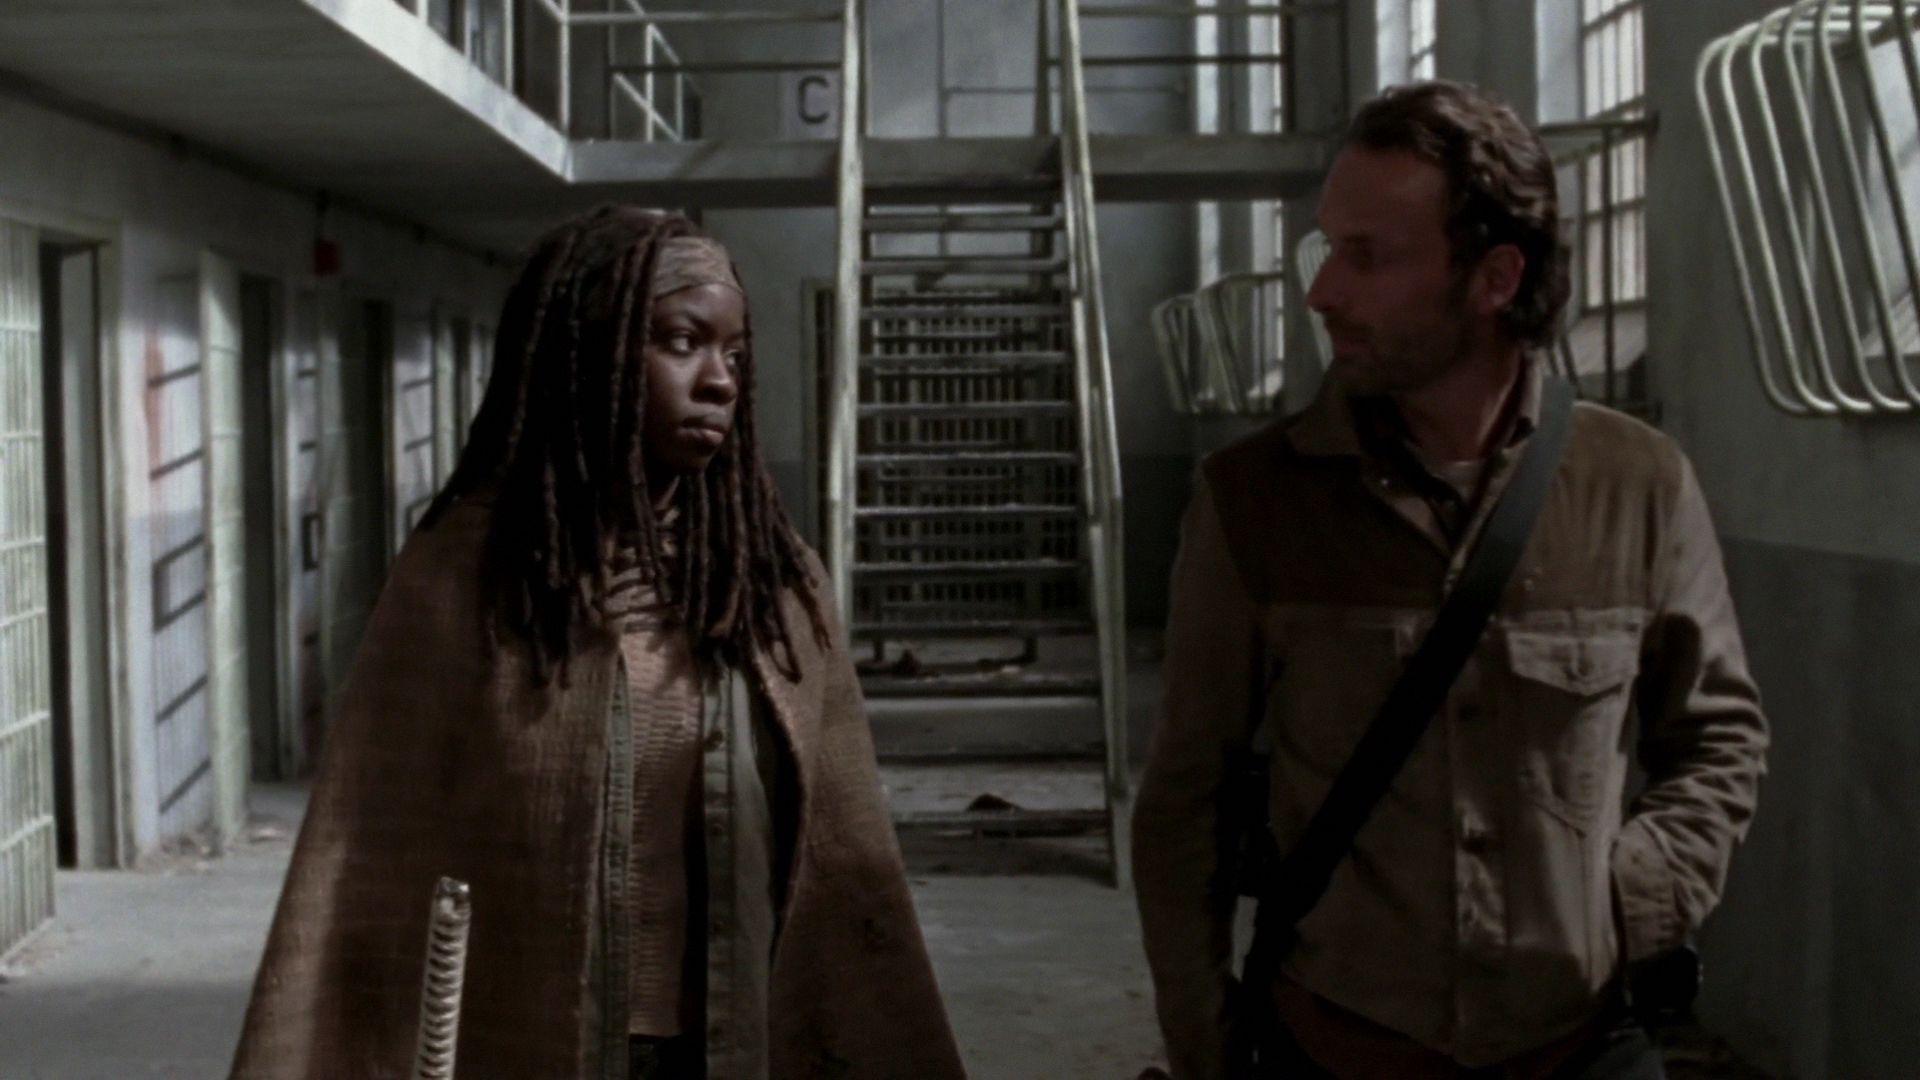 'The Walking Dead' Season 3 Episode 16 Captures